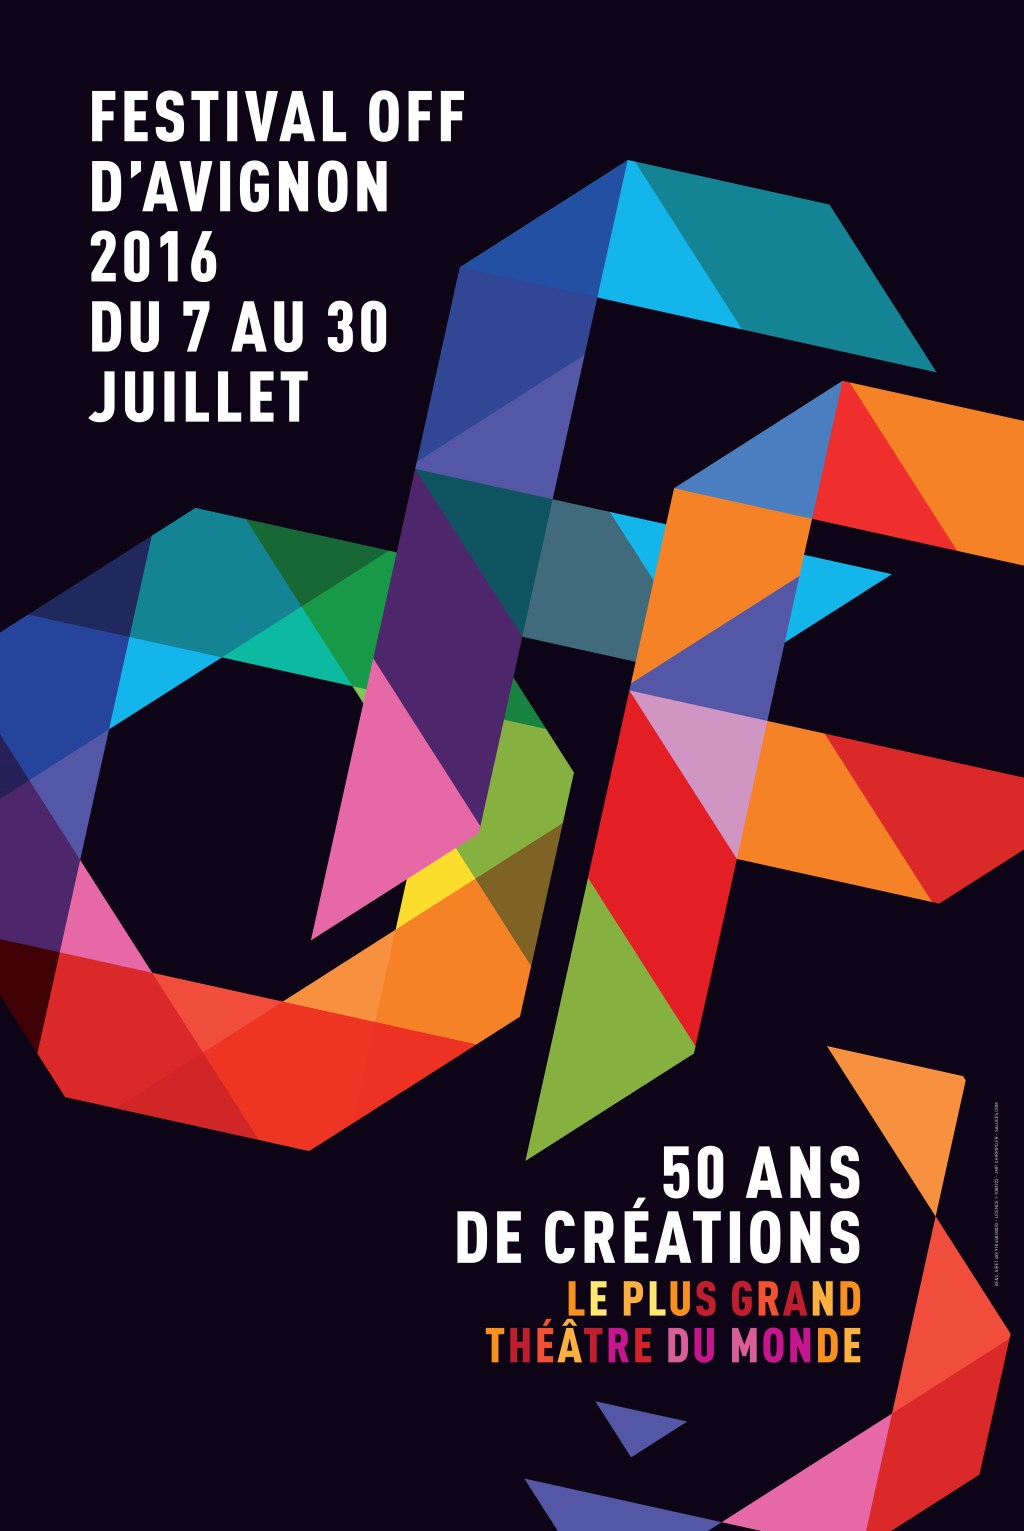 Off d'Avignon 2016